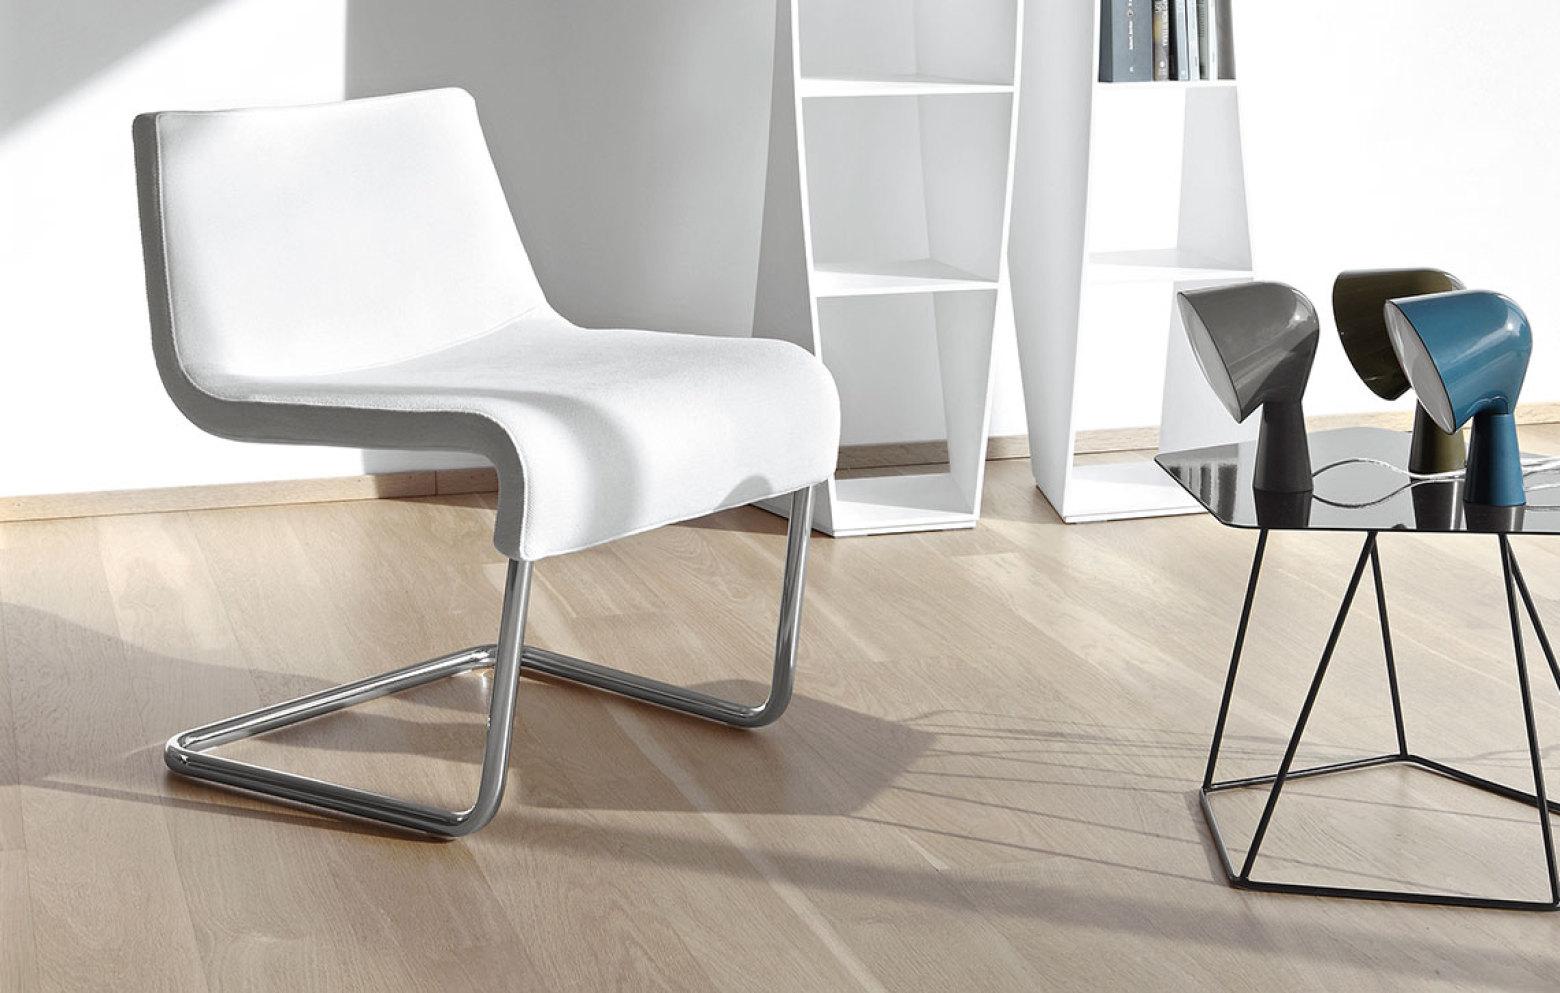 tectonic beistelltische kleinm bel accessoires who. Black Bedroom Furniture Sets. Home Design Ideas